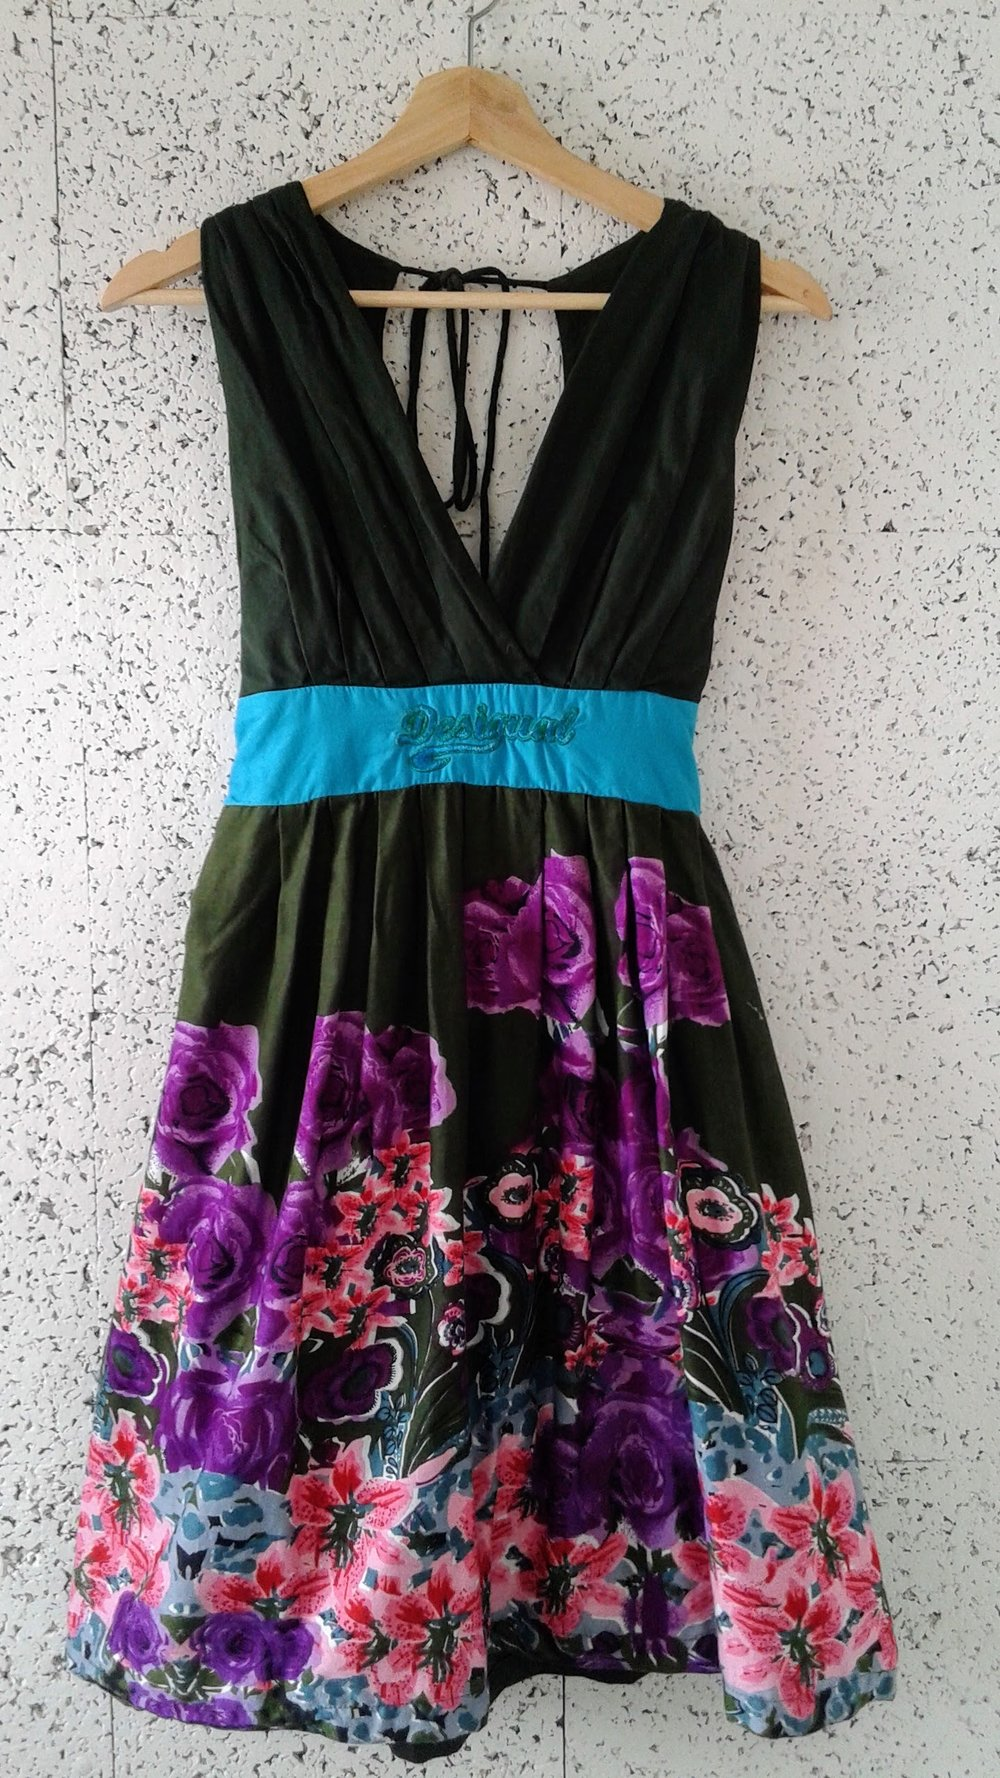 Desigual dress; Size S, $32